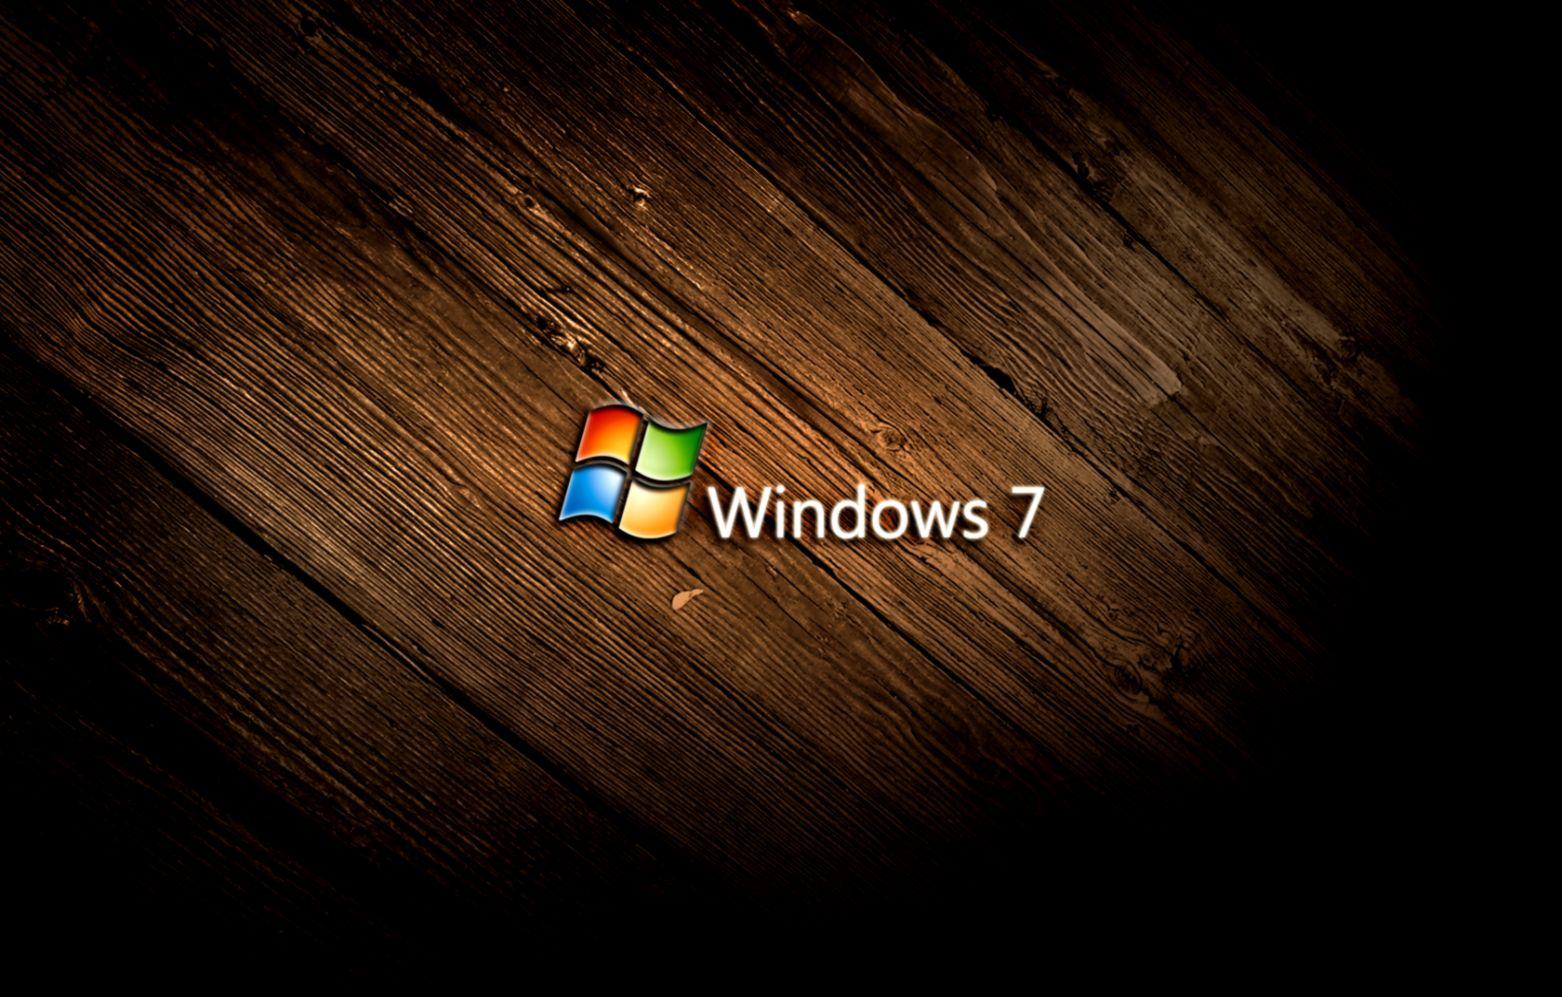 Windows full hd hdtv fhd p wallpapers hd desktop